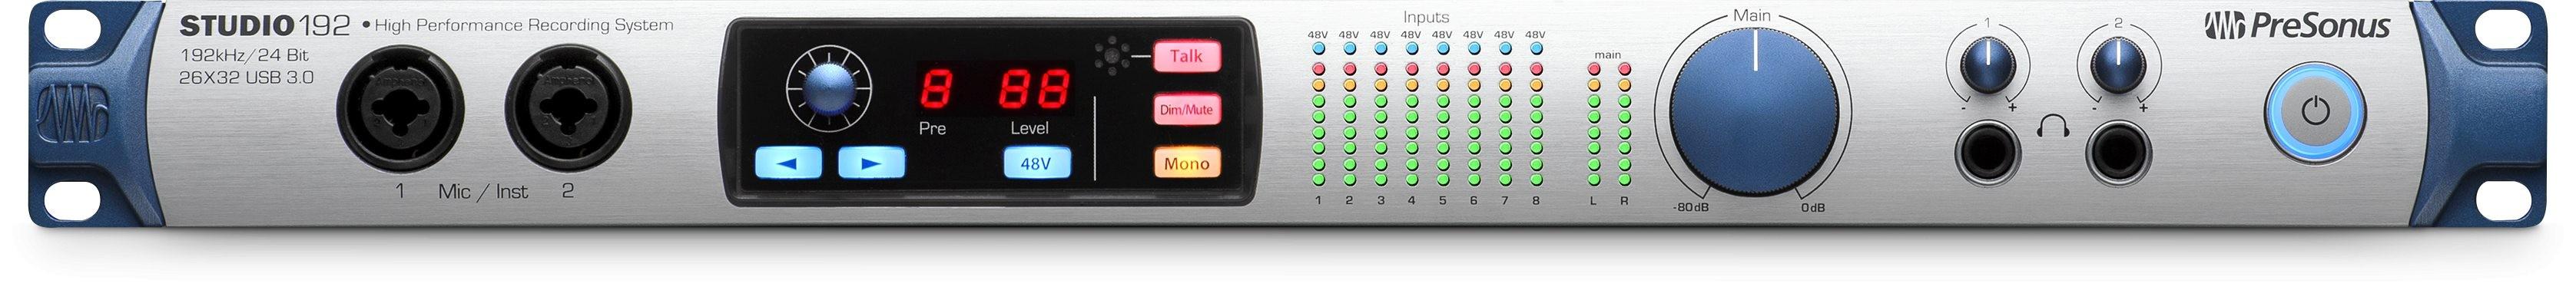 USB 3.0音频接口